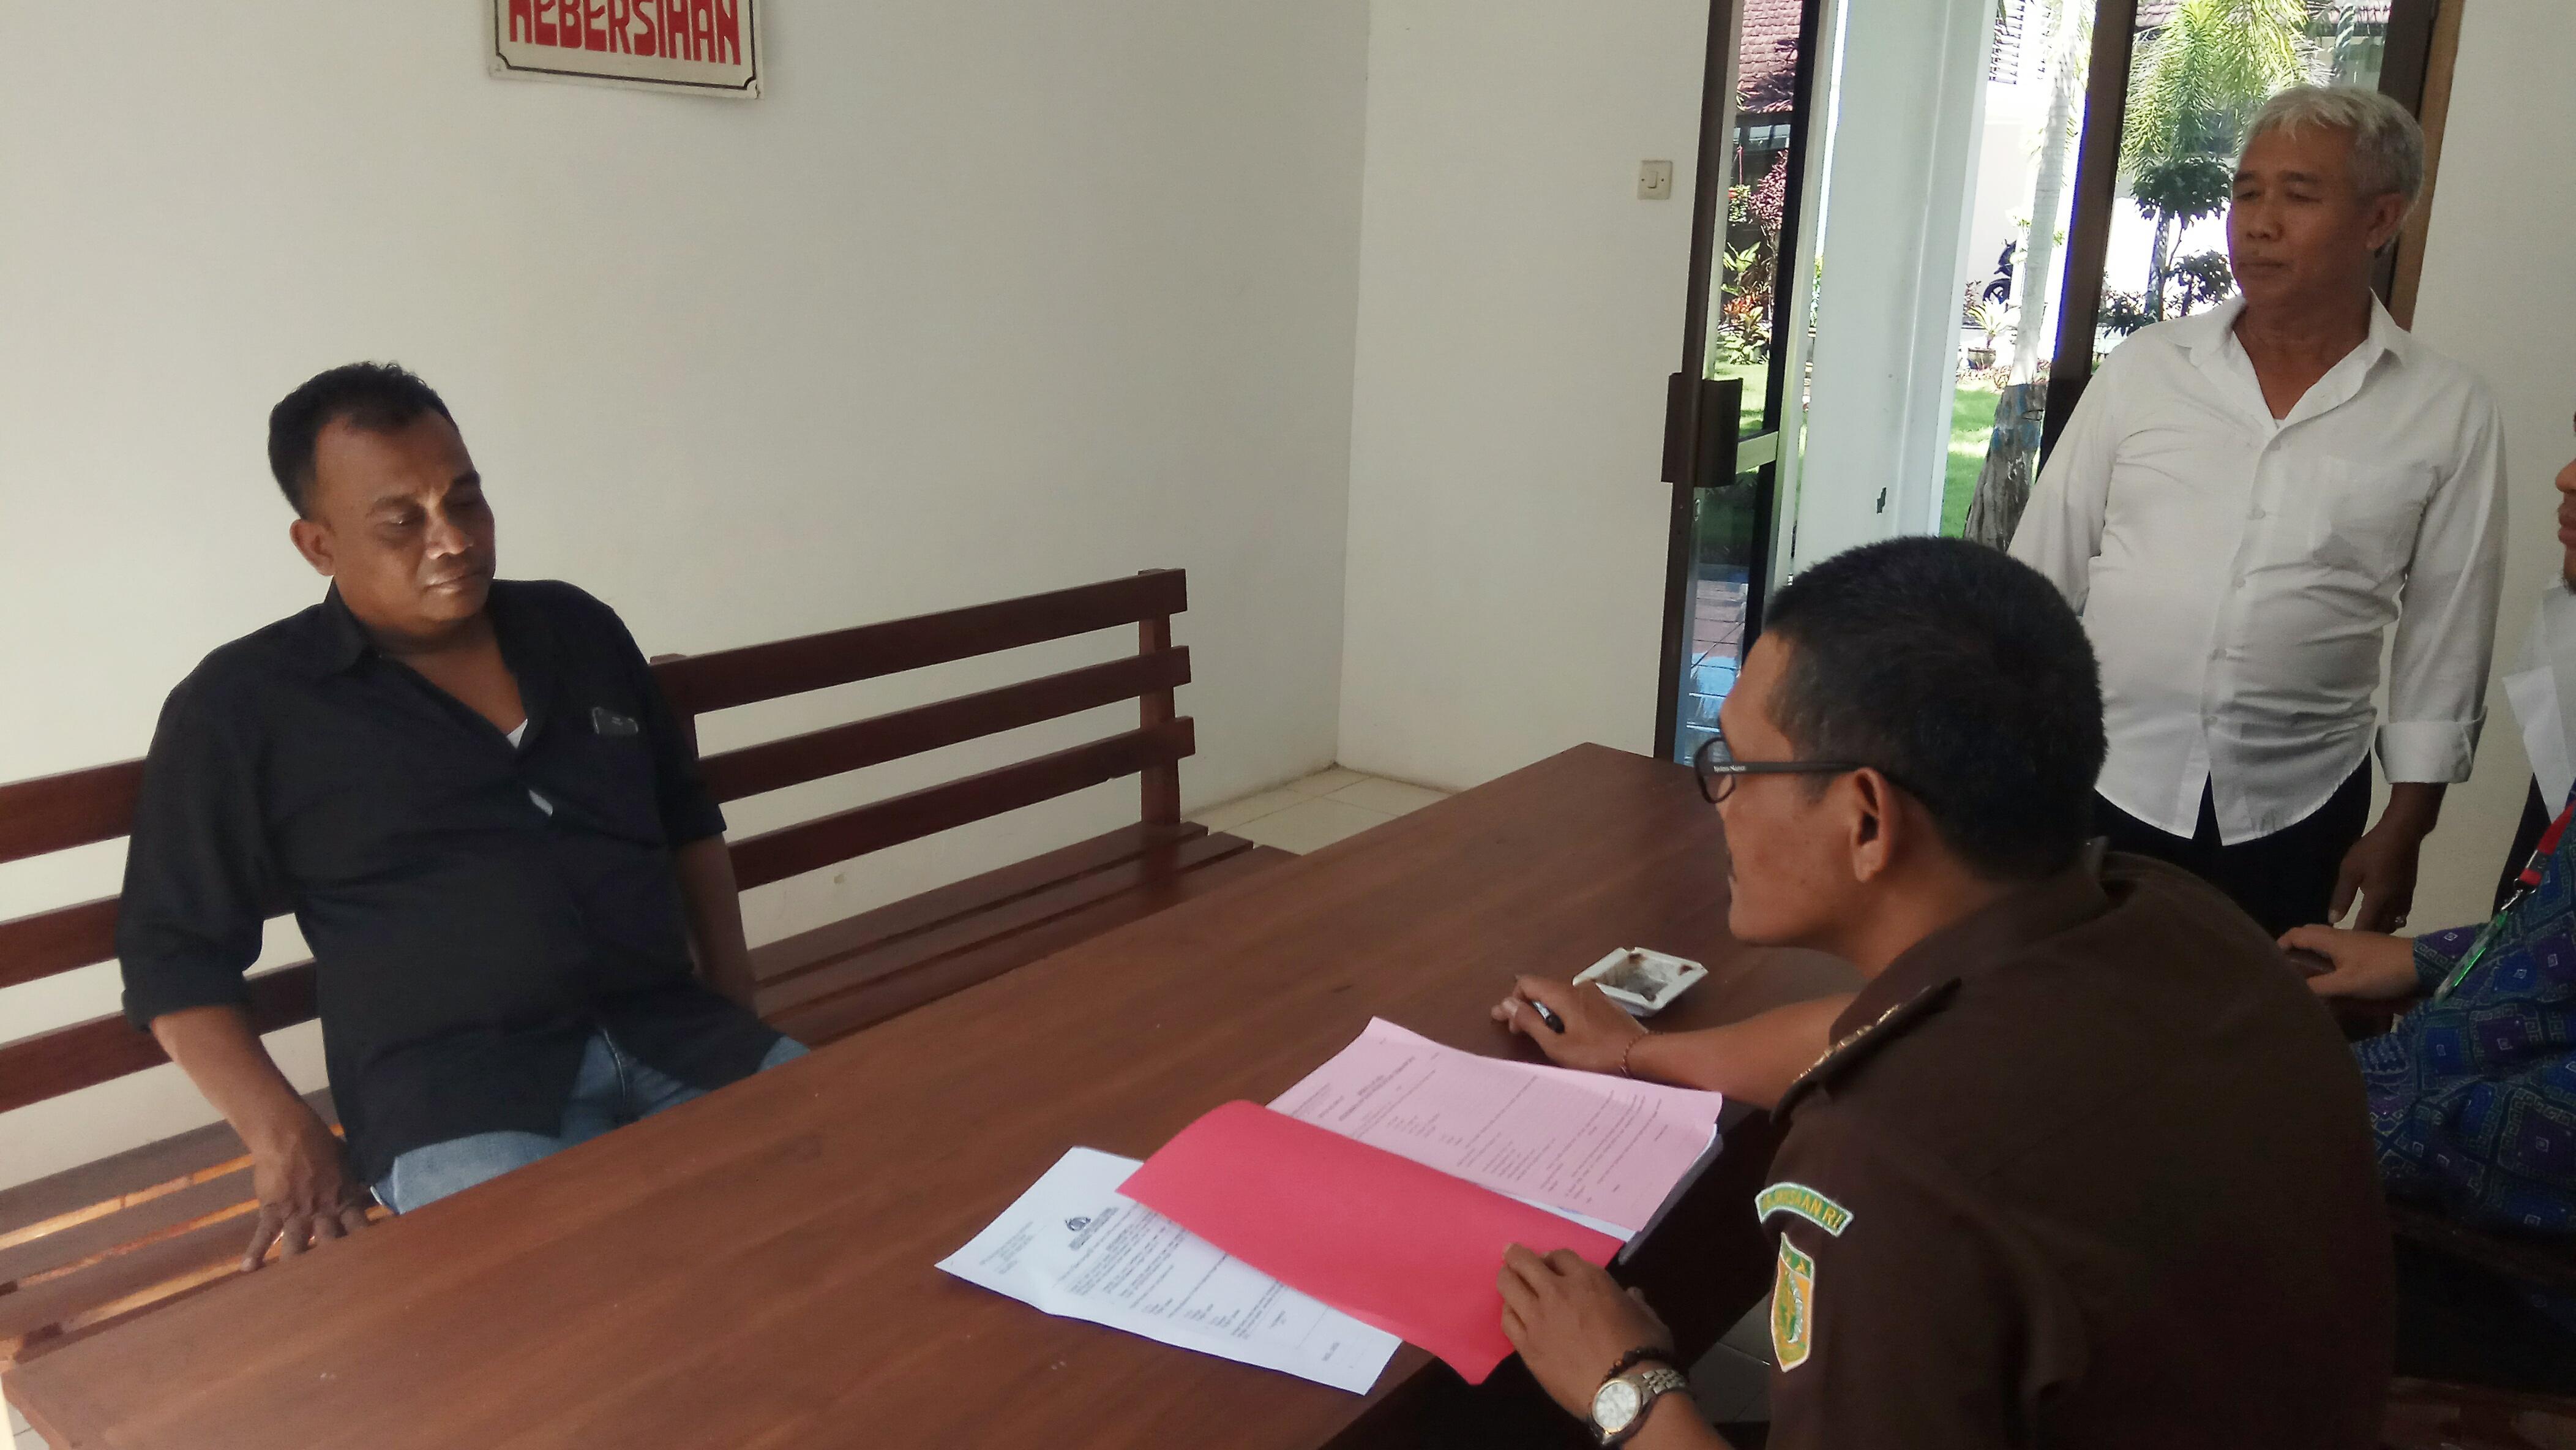 Dr, tersangka perusakan APK menjalani pemeriksaan di Kantilor Kejaksaan Negeri Banyuwangi